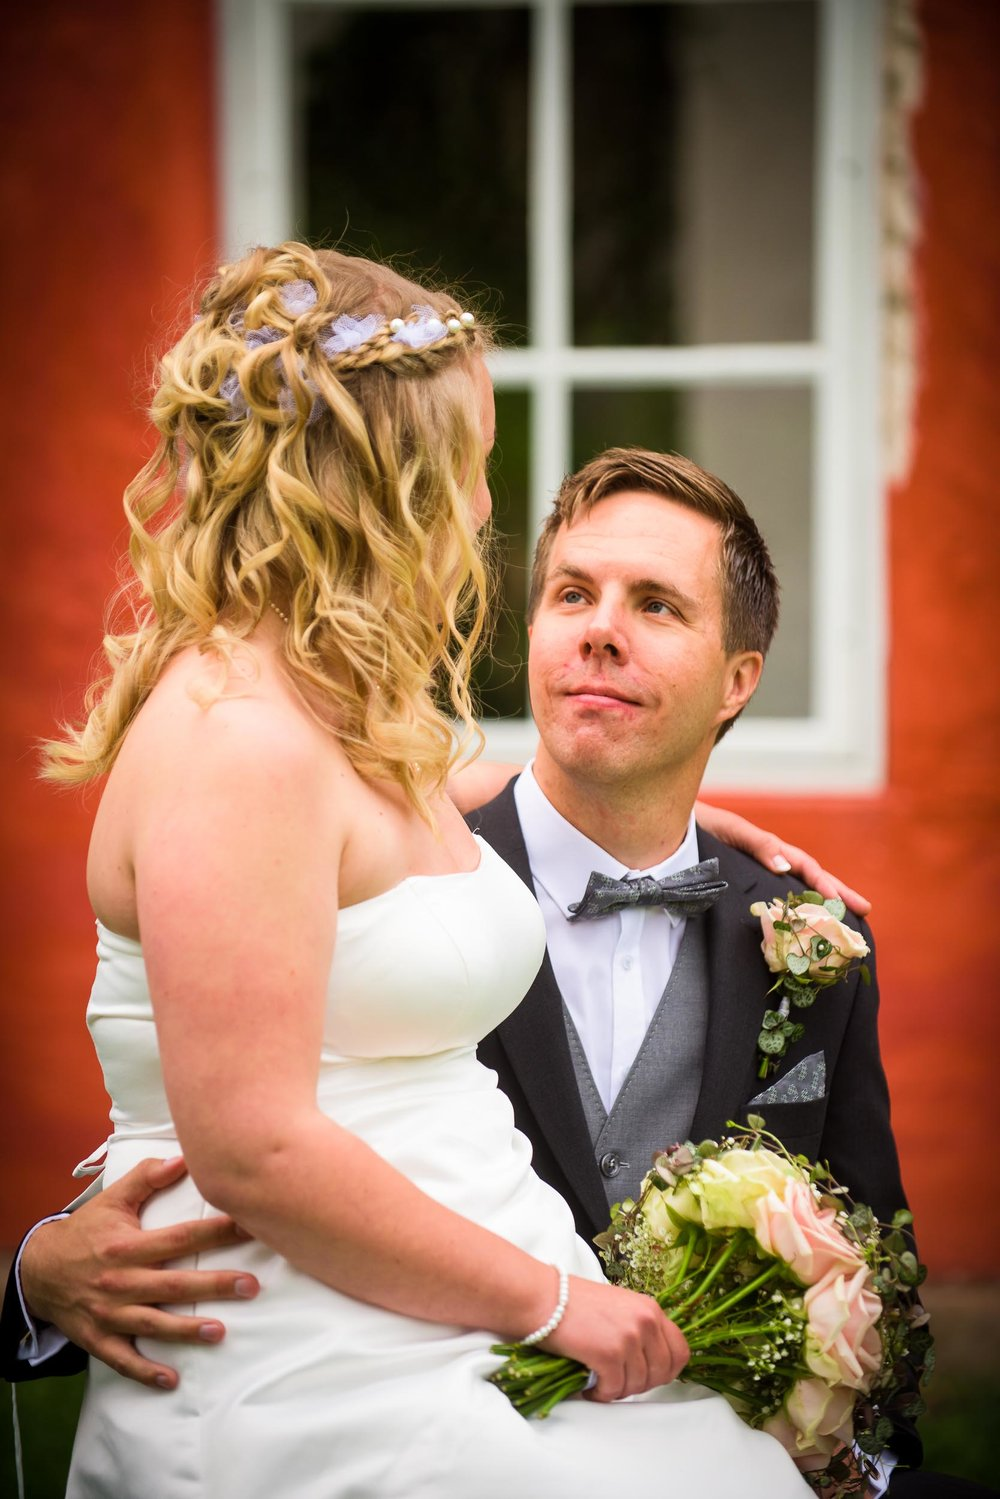 bröllopsfoto-tyringe-aug17-2.jpg